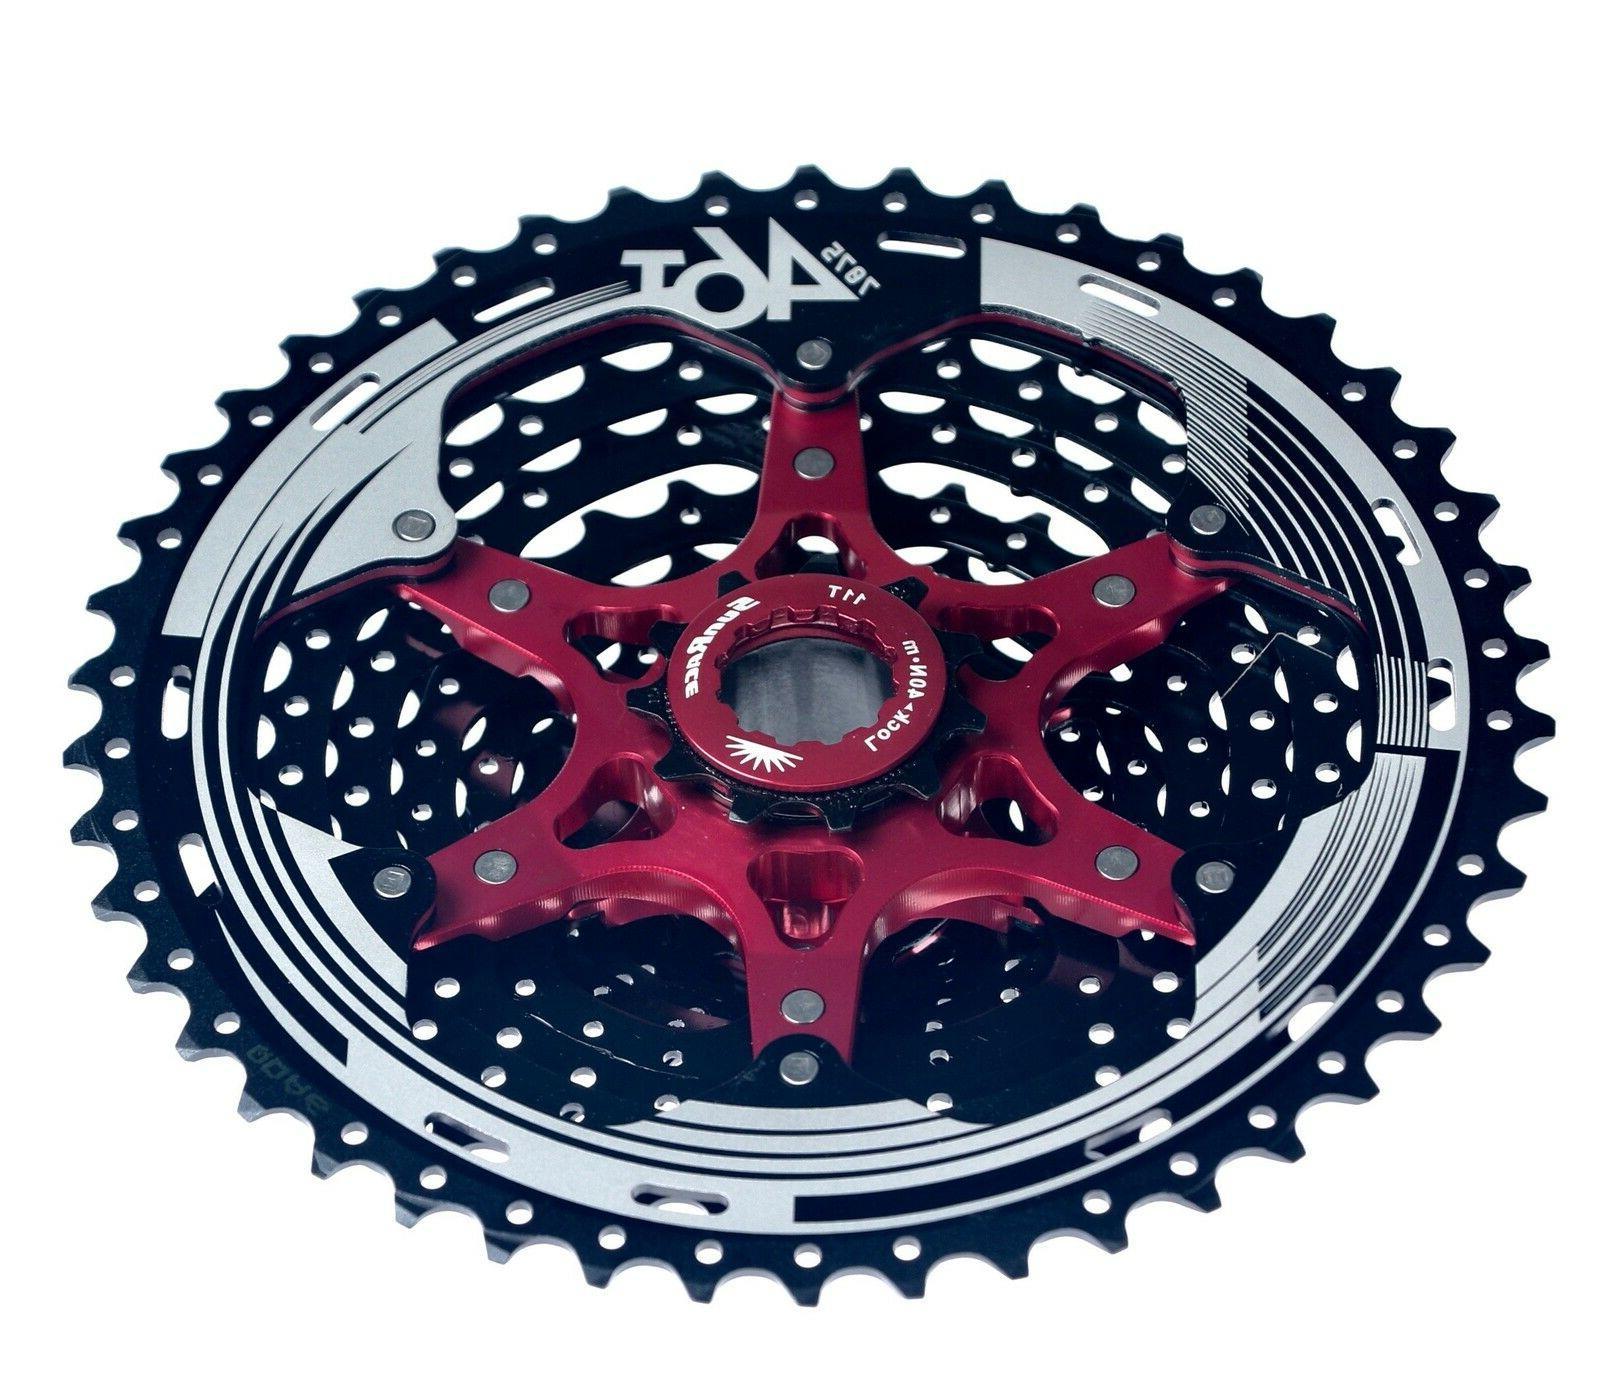 Sunrace MX8 Mega Wide Range 11-46T  DH/FR/XC MTB Bicycle Bik